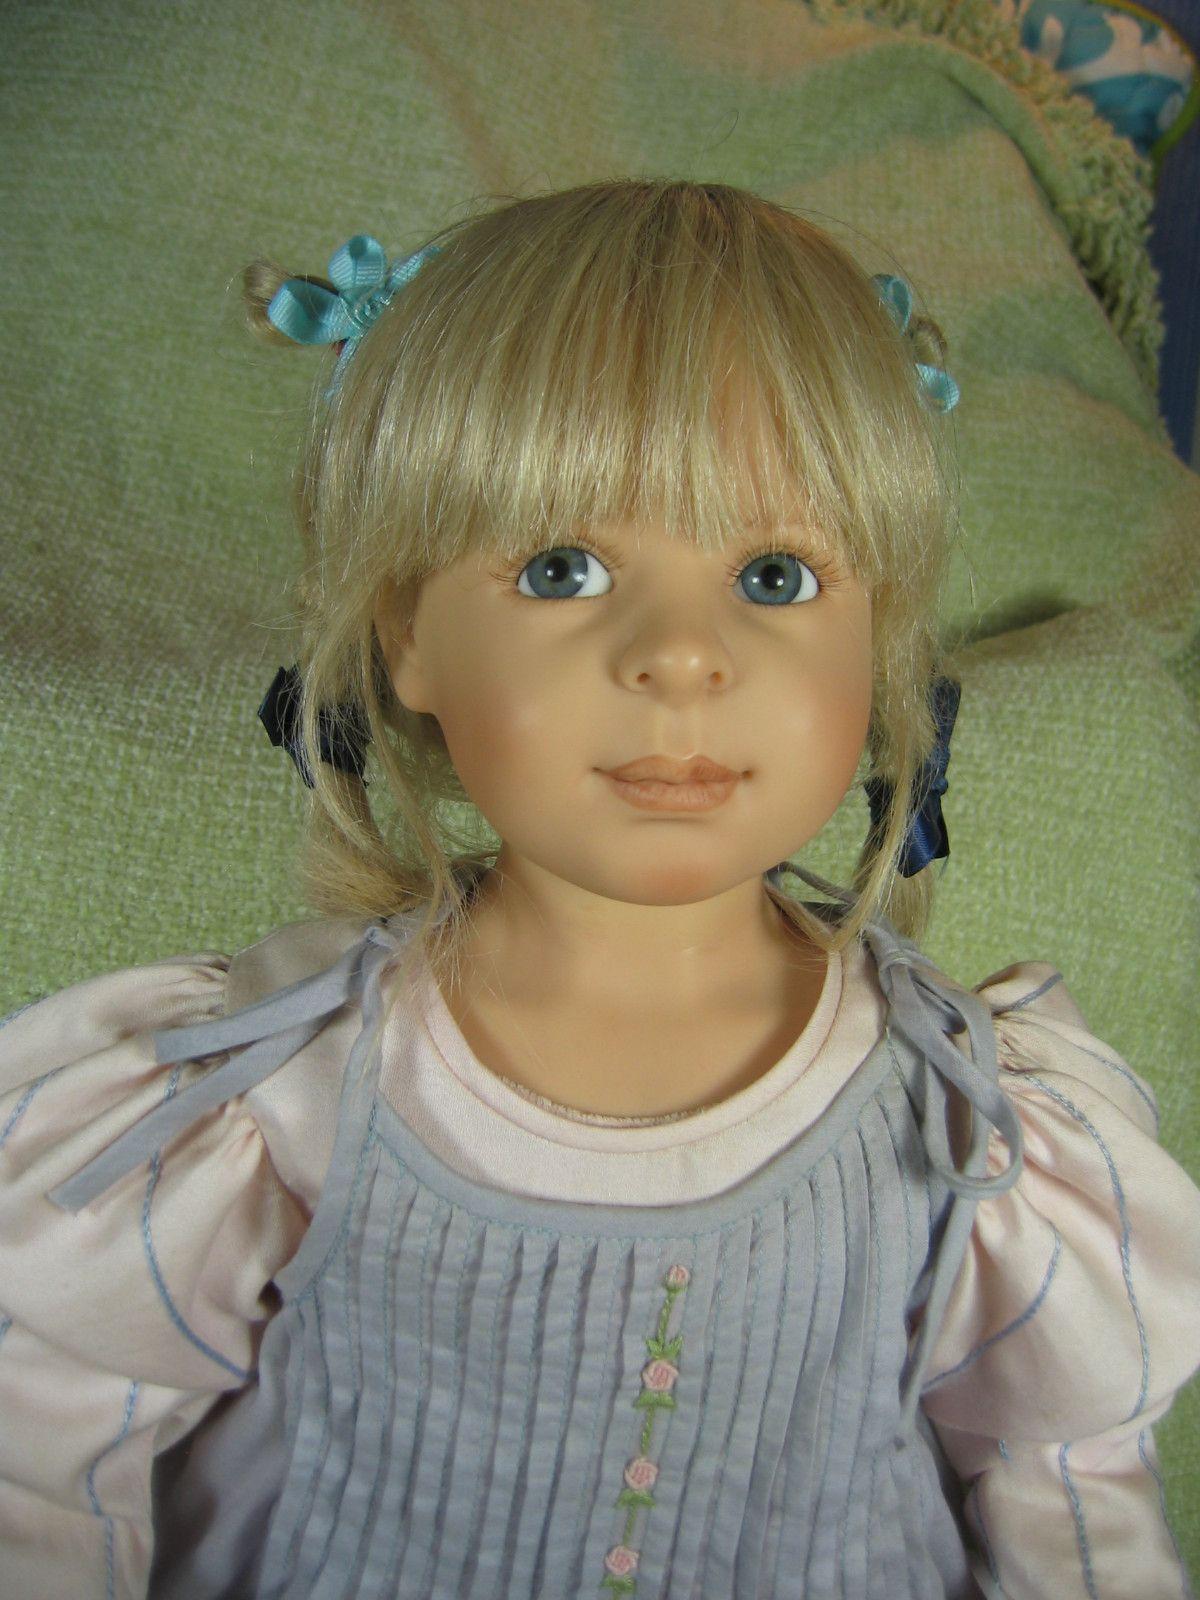 "Rosemary Lovely Handpainted 25"" Doll by Heidi Plusczok | eBay"